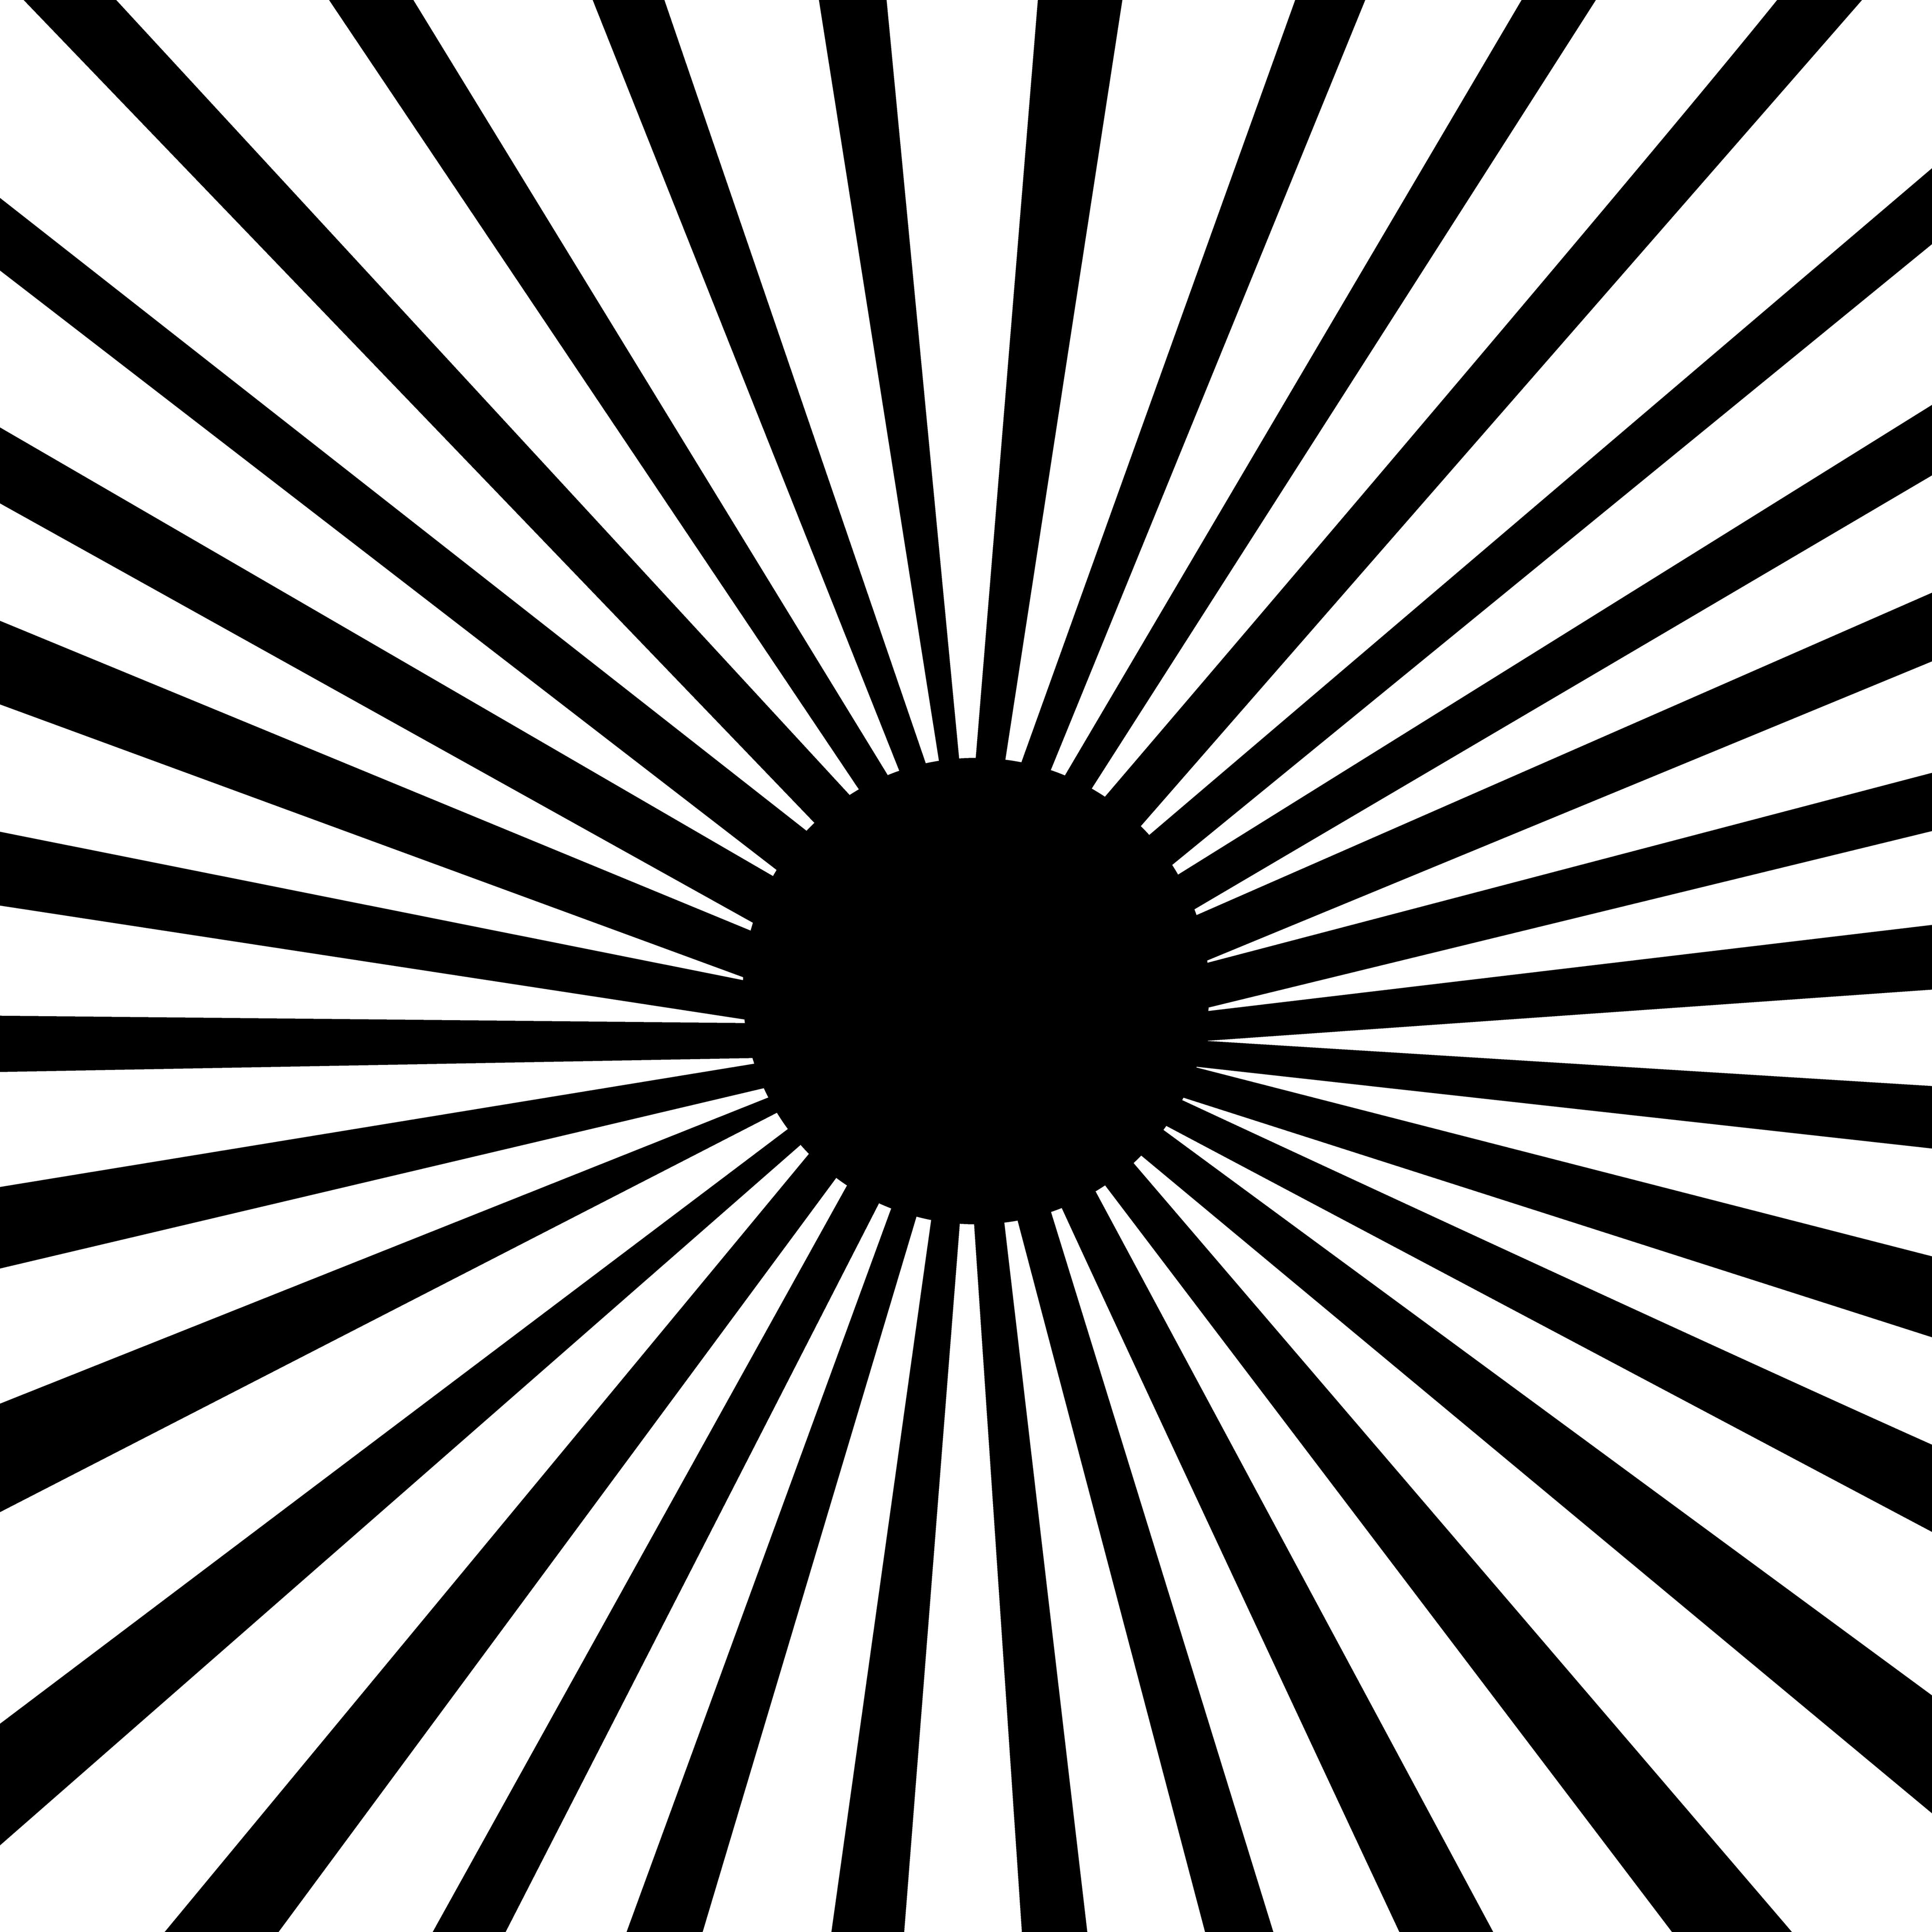 Http Sweetclipart Com Multisite Sweetclipart Files Line Burst Pattern Inverse Black White Png Black And White Black And White Lines Black And White Prints